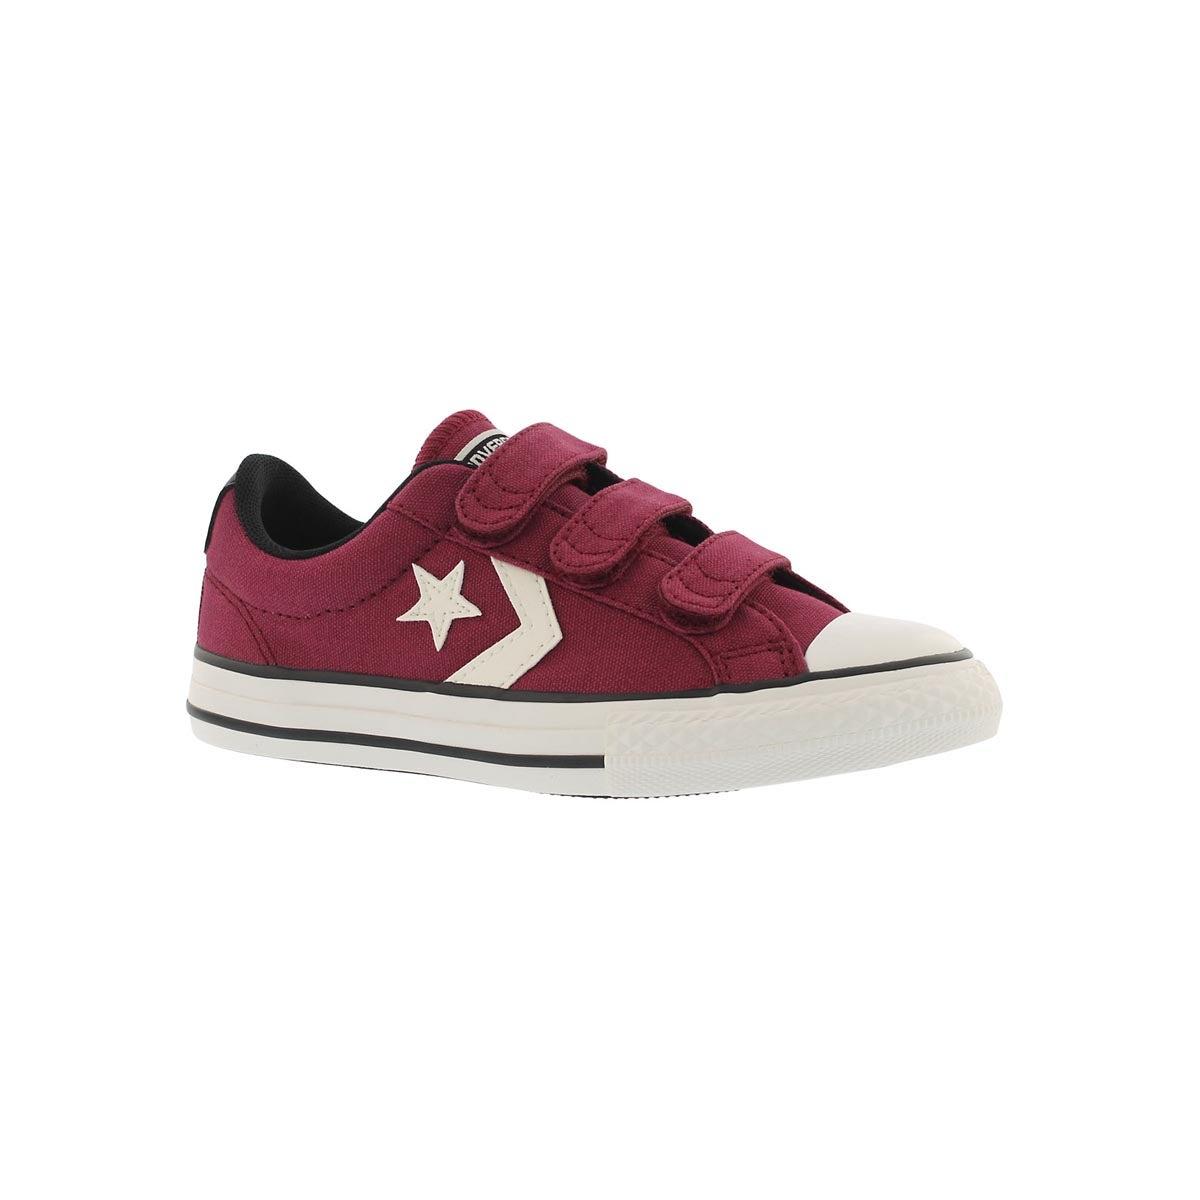 Boys CT STAR PLAYER 3V rhubarb sneakers